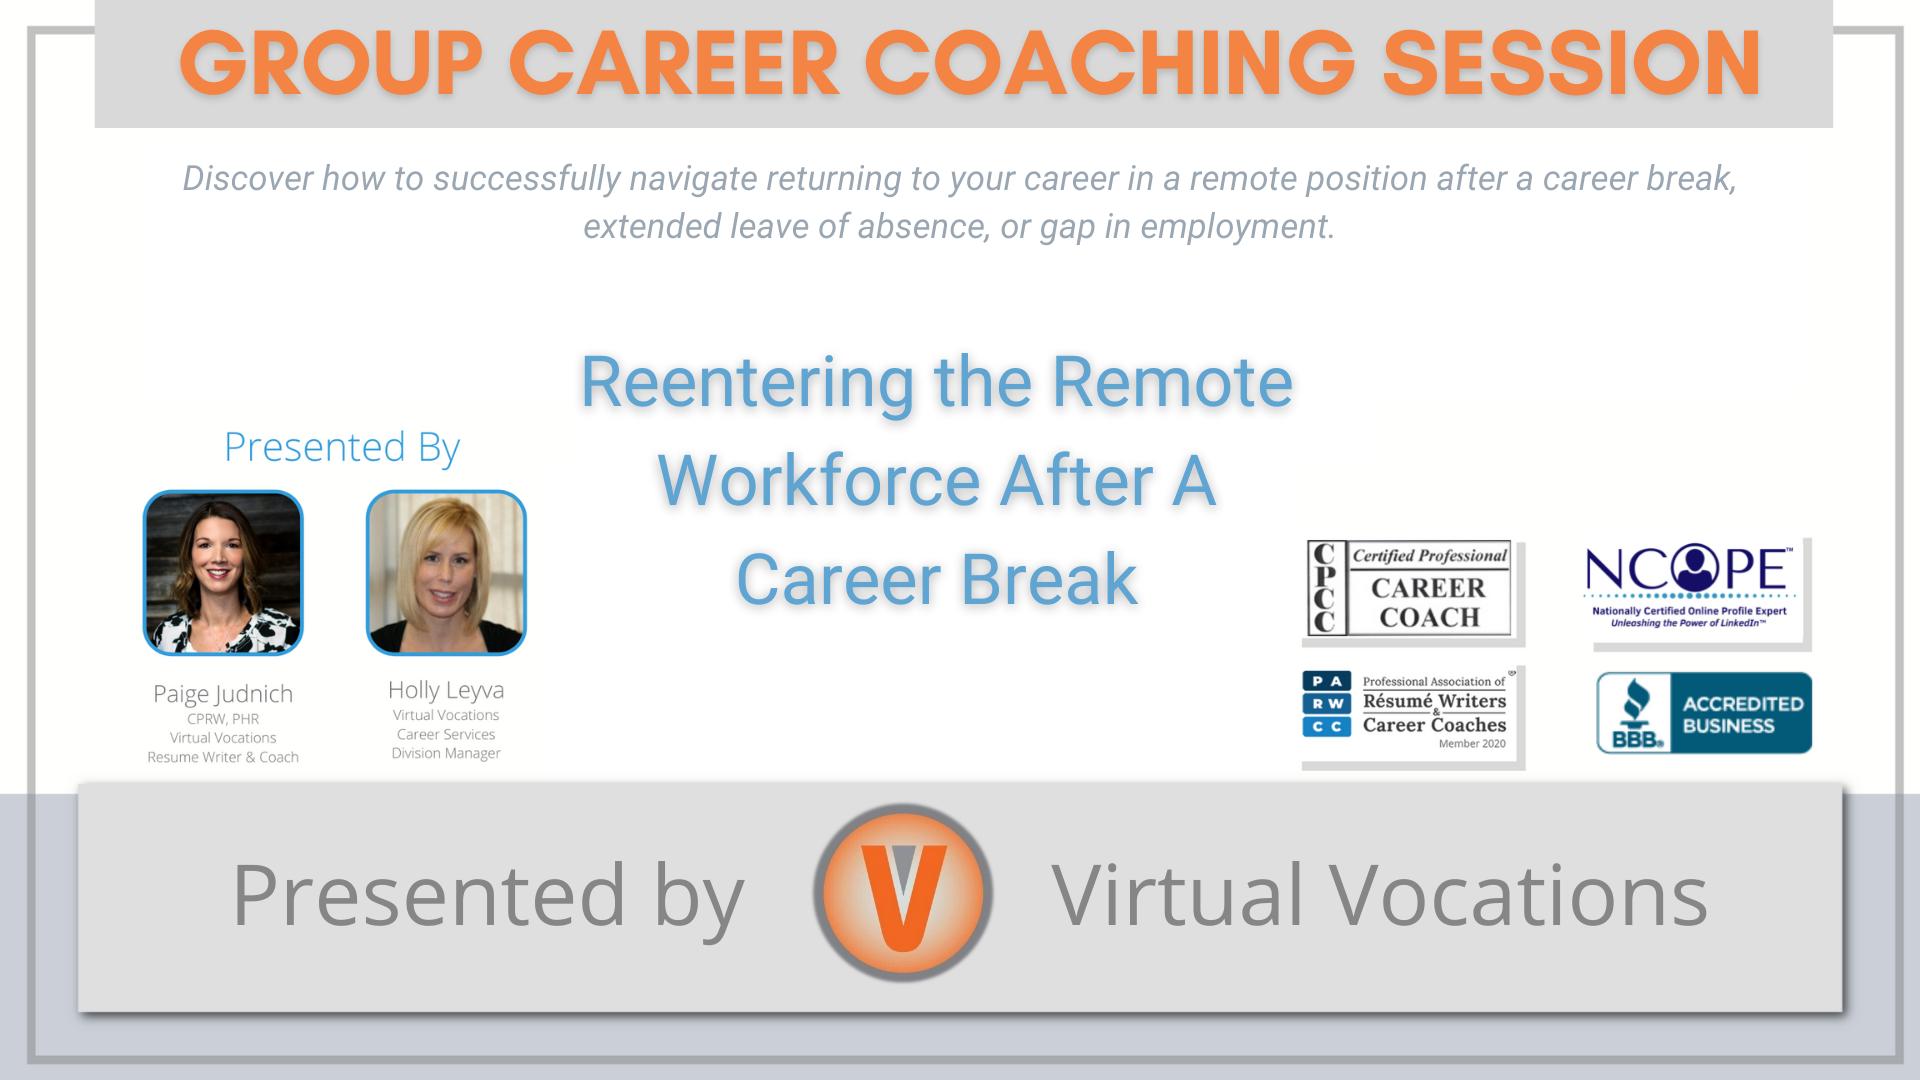 Reentering the Remote Workforce After A Career Break